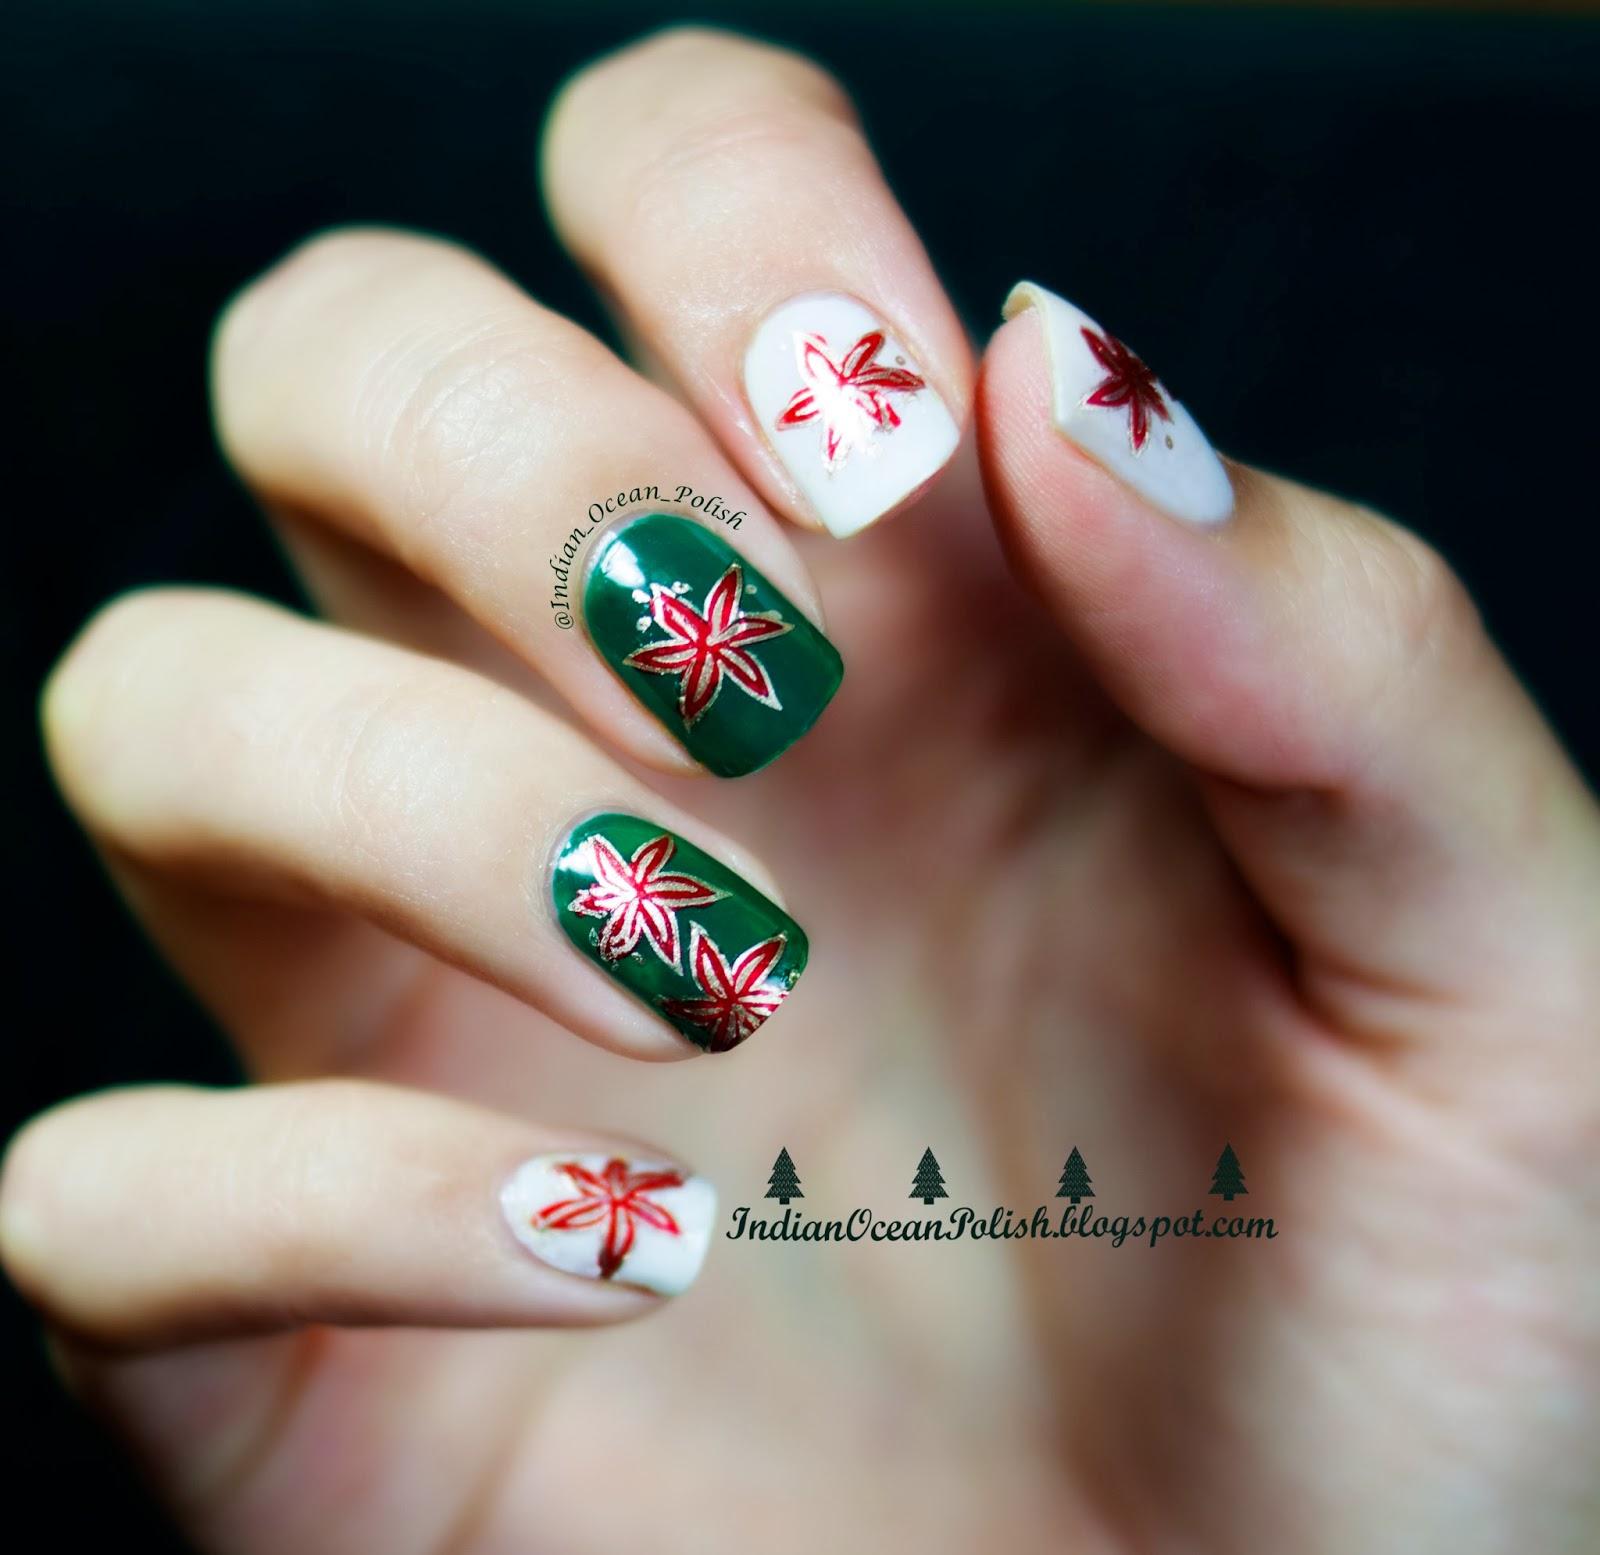 Indian Ocean Polish Christmas 2013 Nail Art Ideas Simple And Not